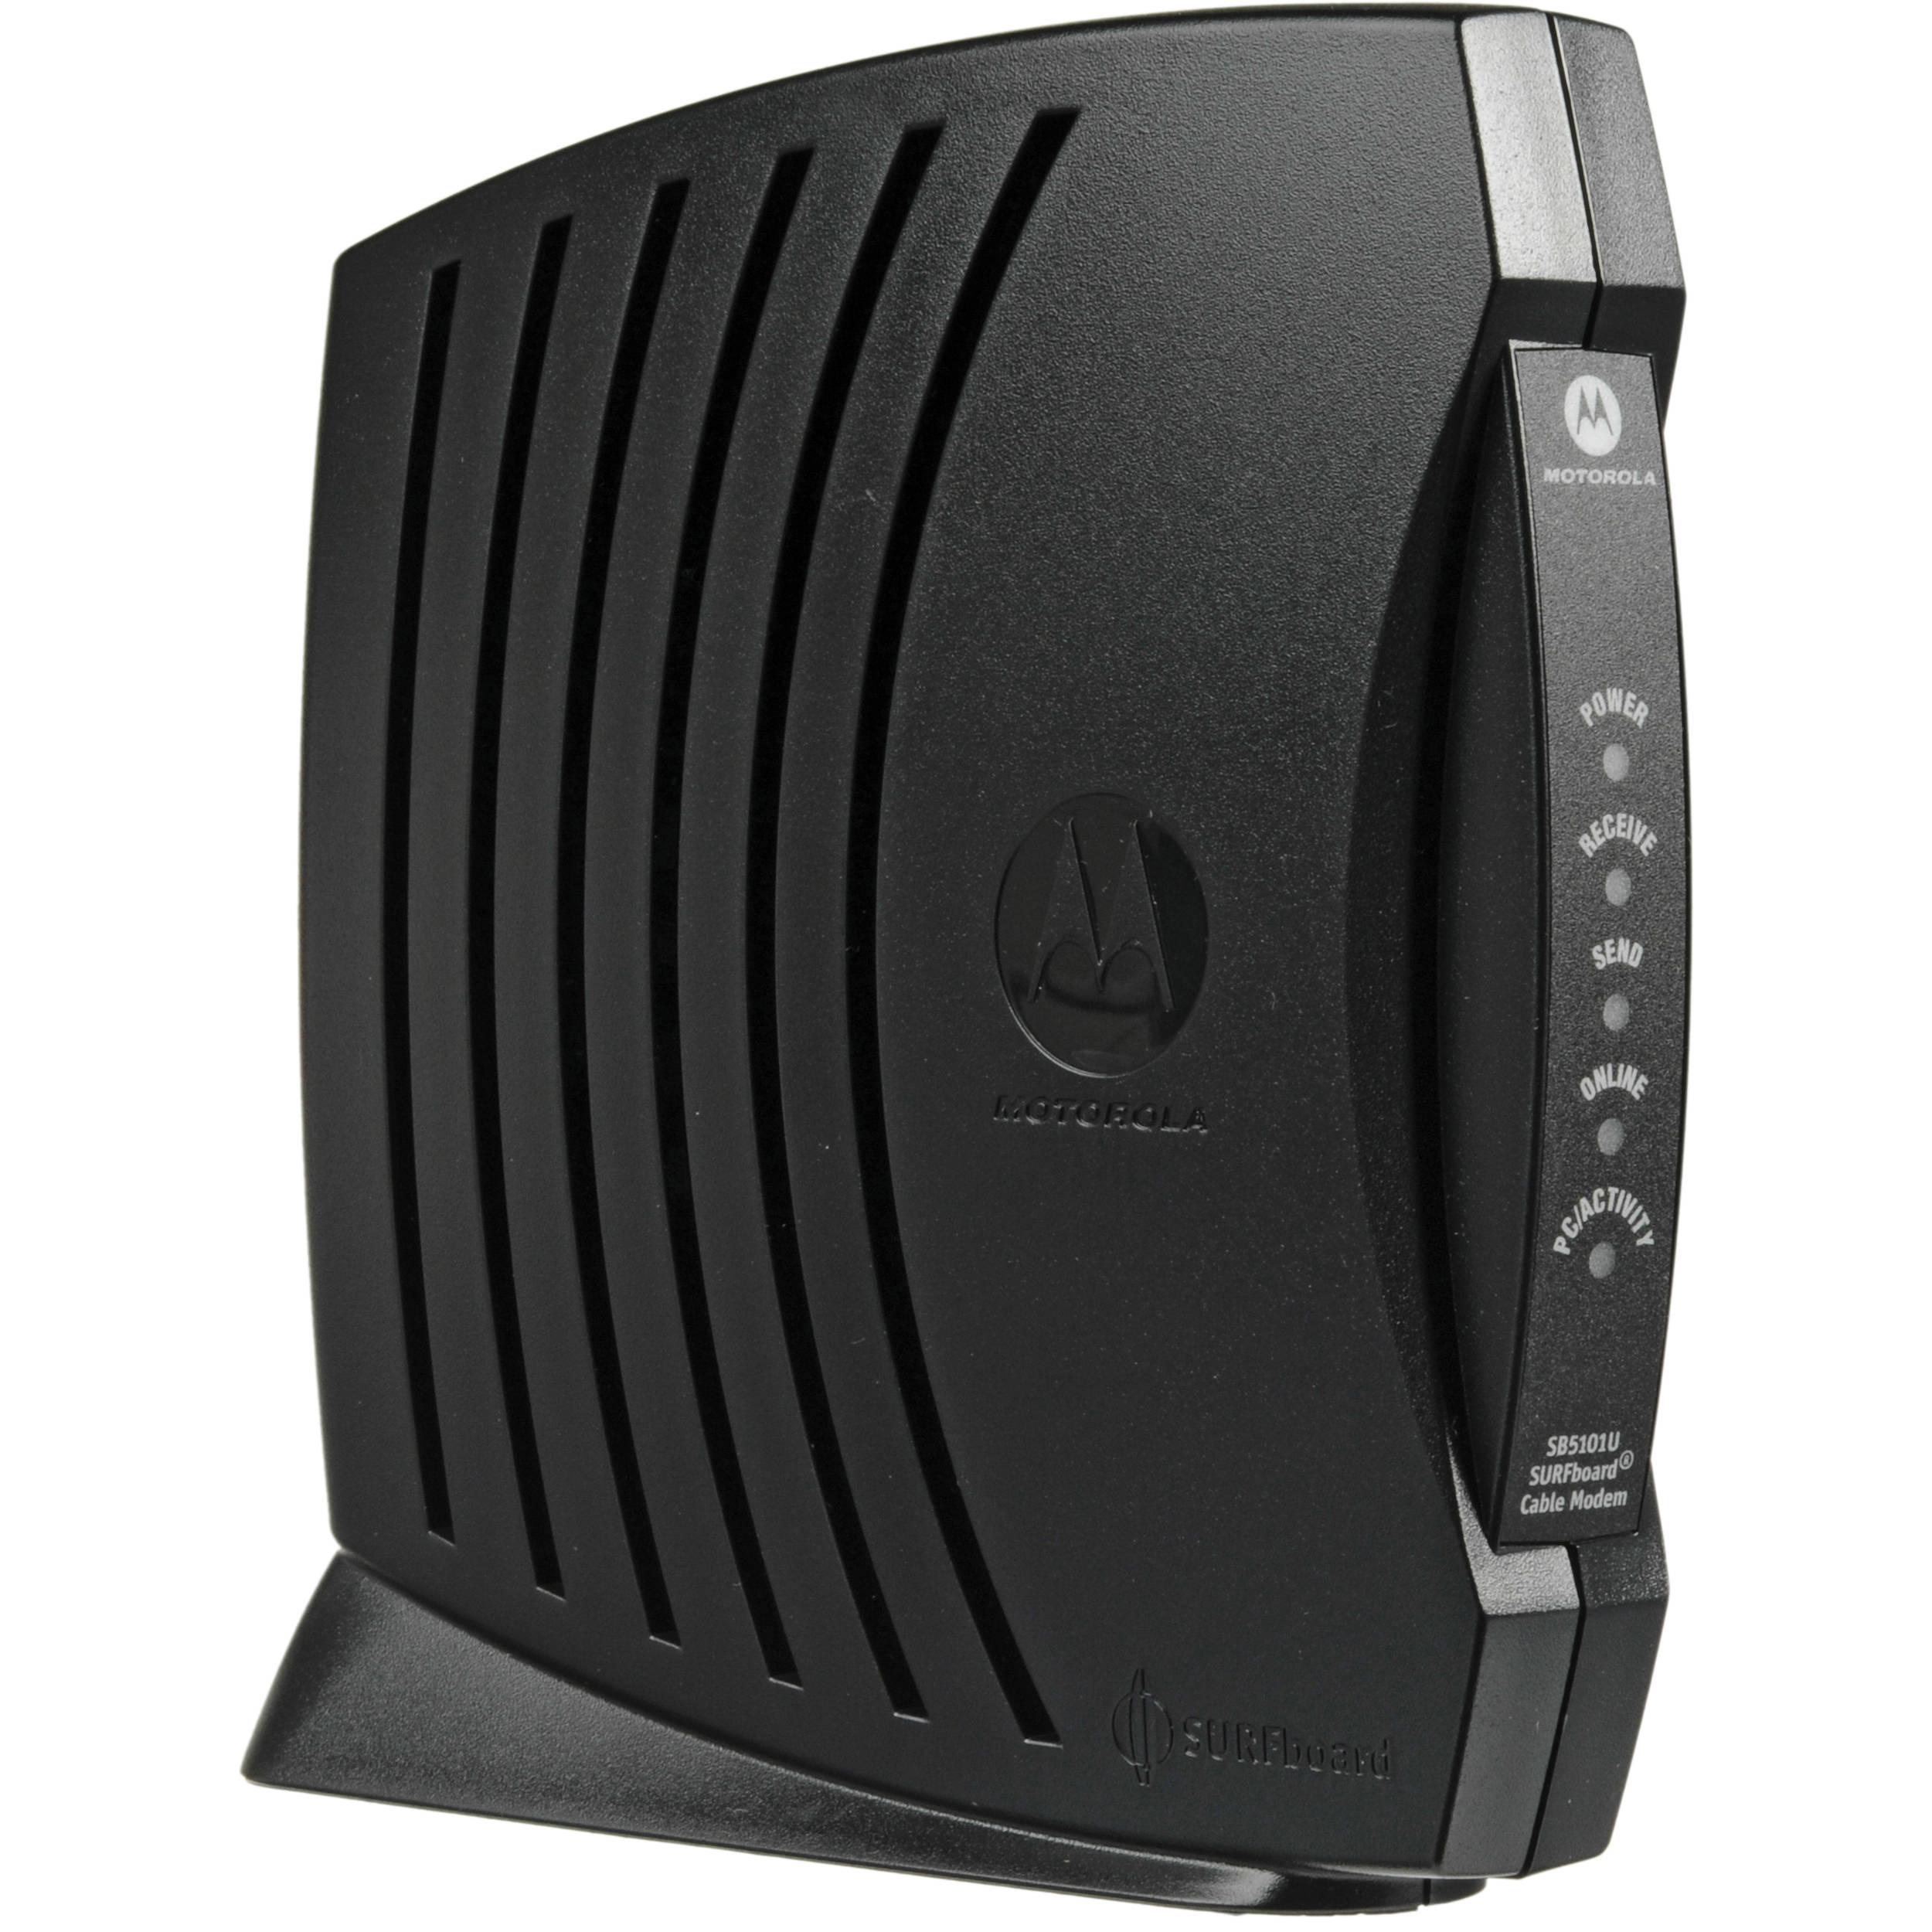 Motorola Sb5101u Surfboard Docsis 2 0 Retail Cable 567005